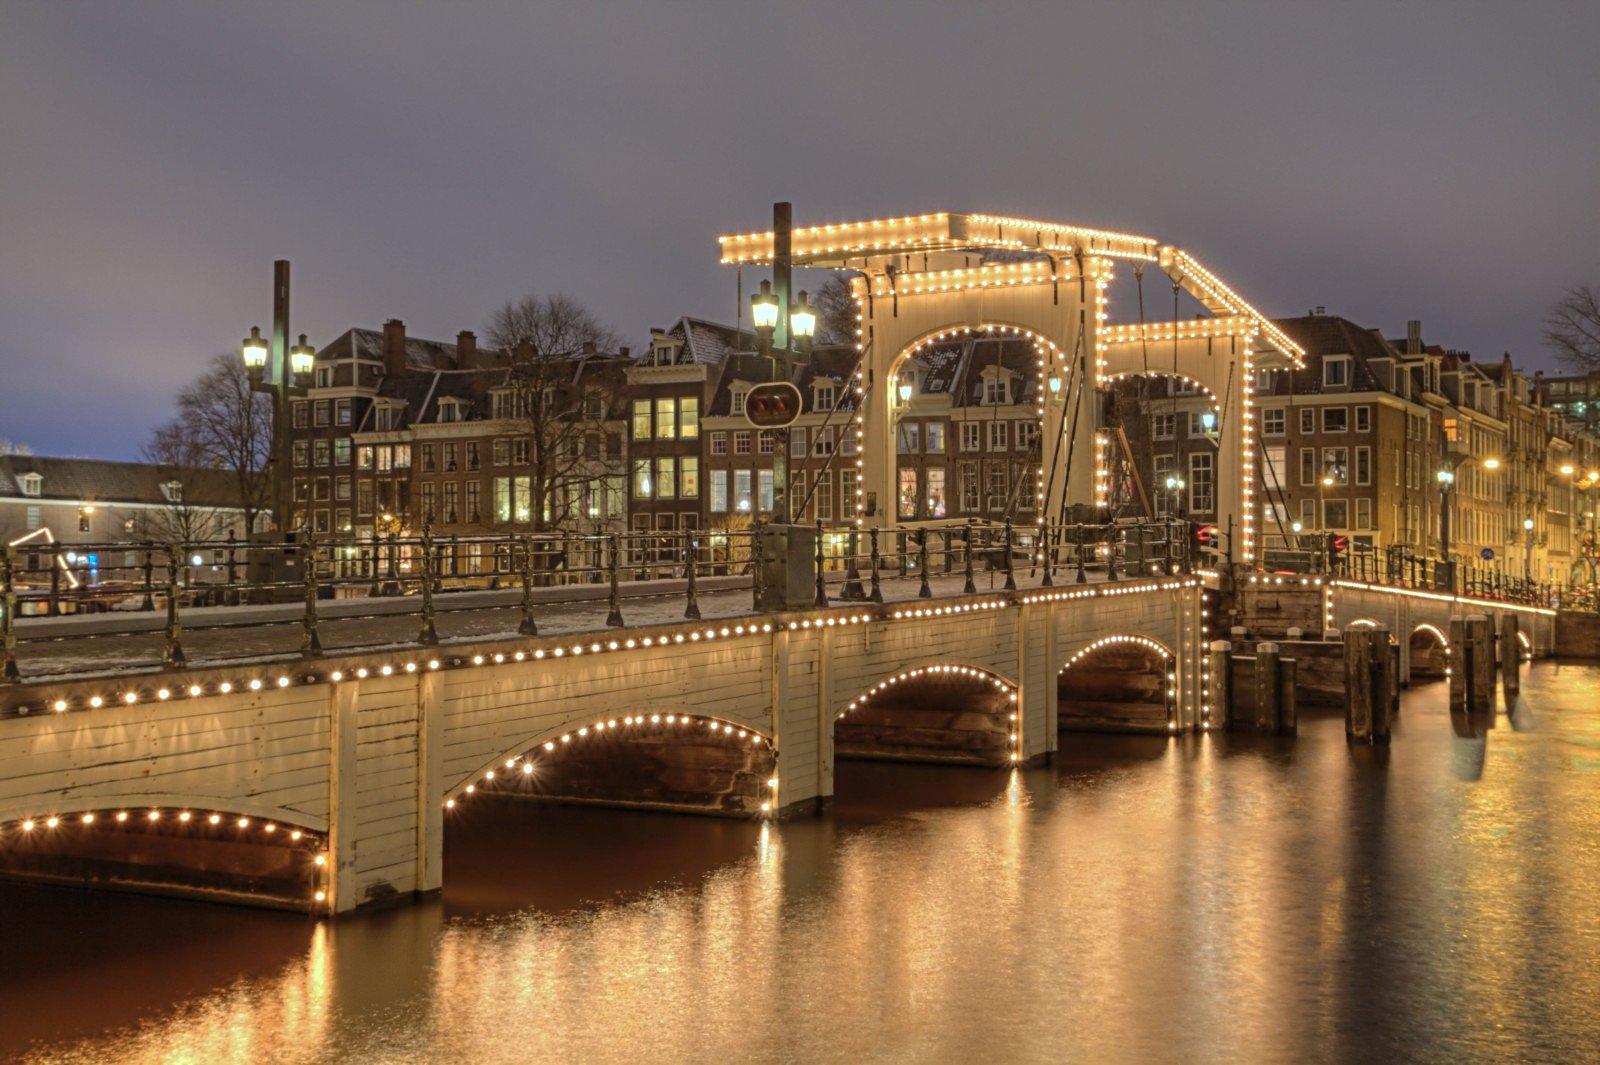 Amsterdam_Magere_Brug